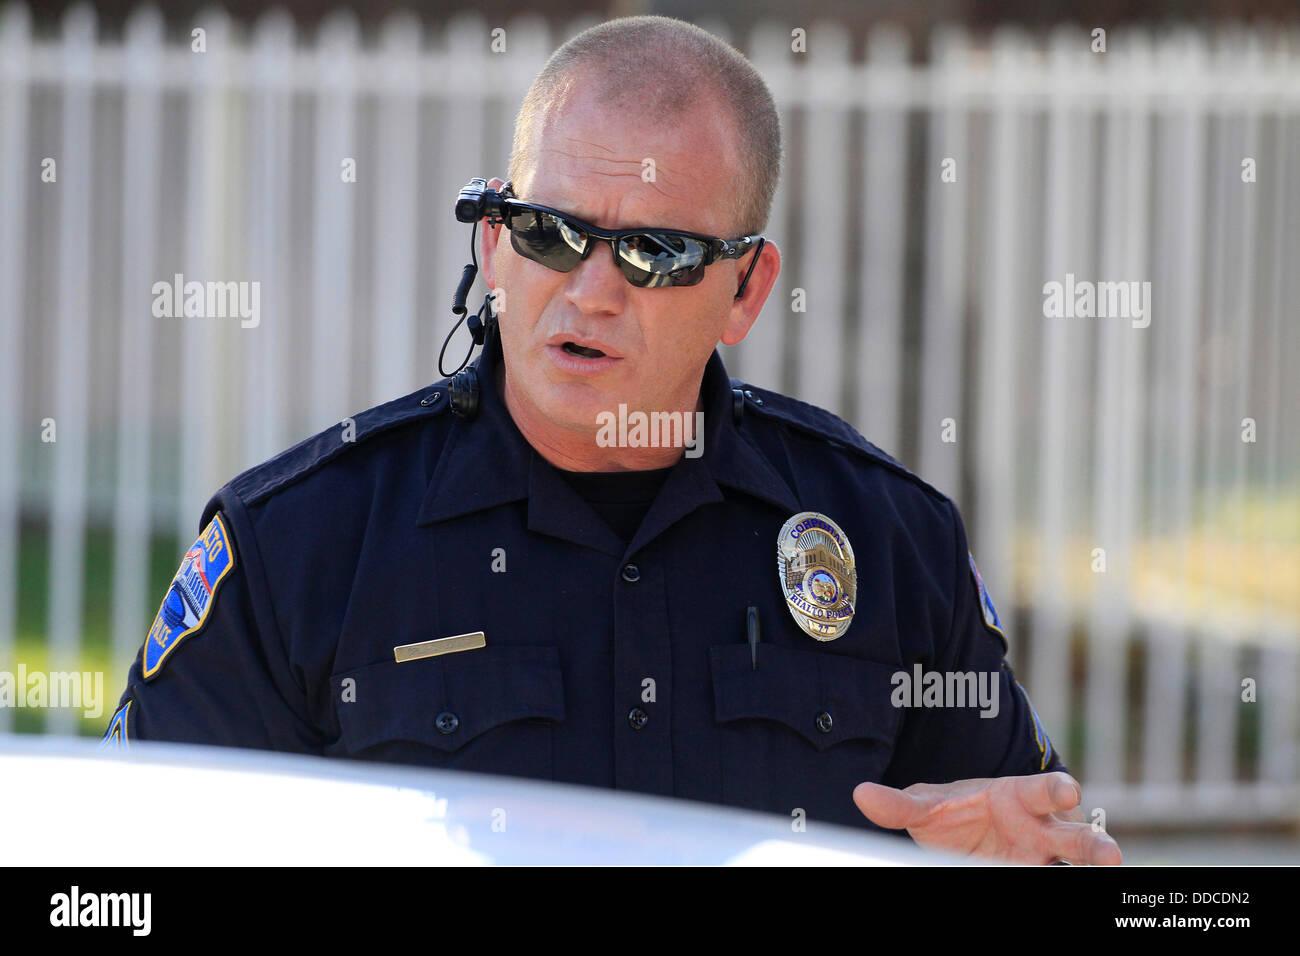 Aug. 19, 2013 - Rialto, California, U.s - Rialto Police Department ...